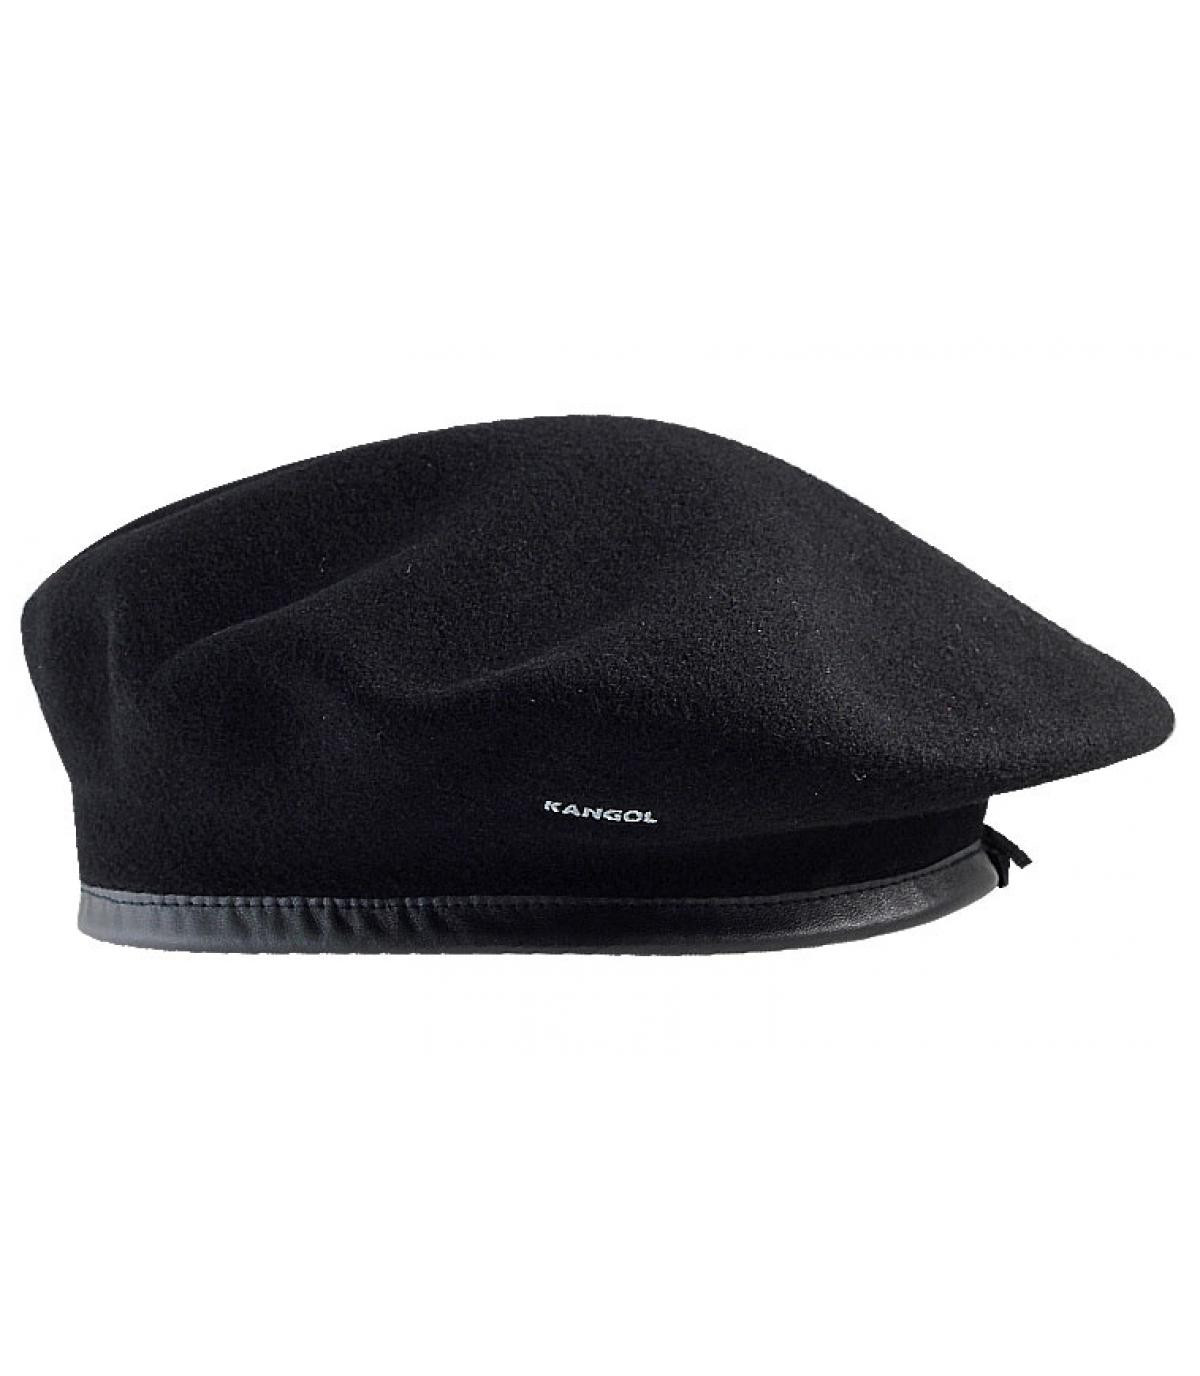 82f4fc1dd242e Monty beret kangol - Wool monty black by Kangol.